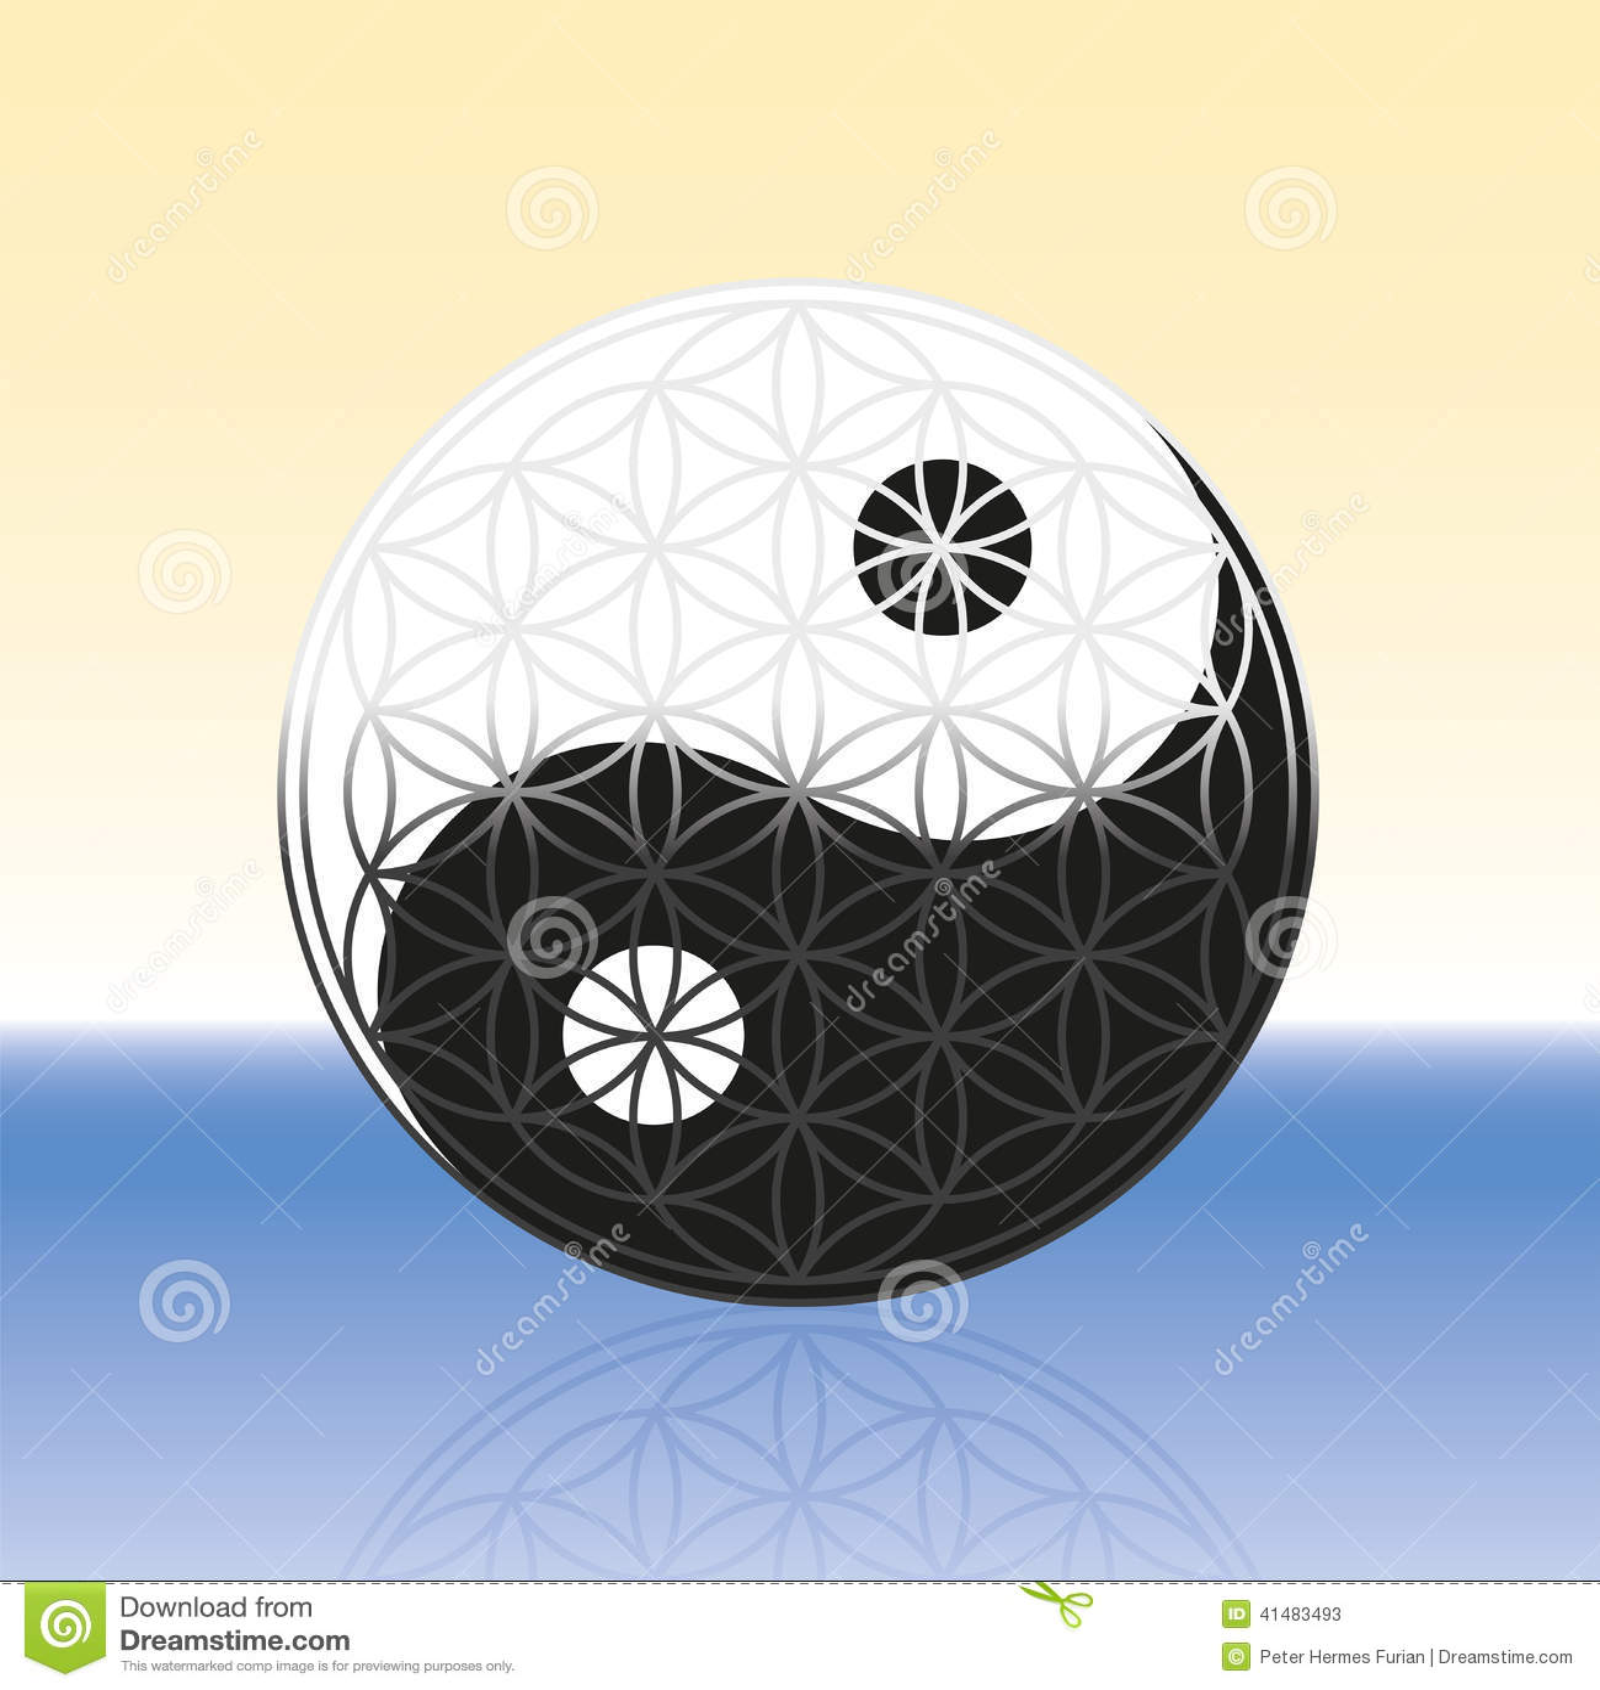 Flower Of Life Yin Yang Spheres Stock Photo